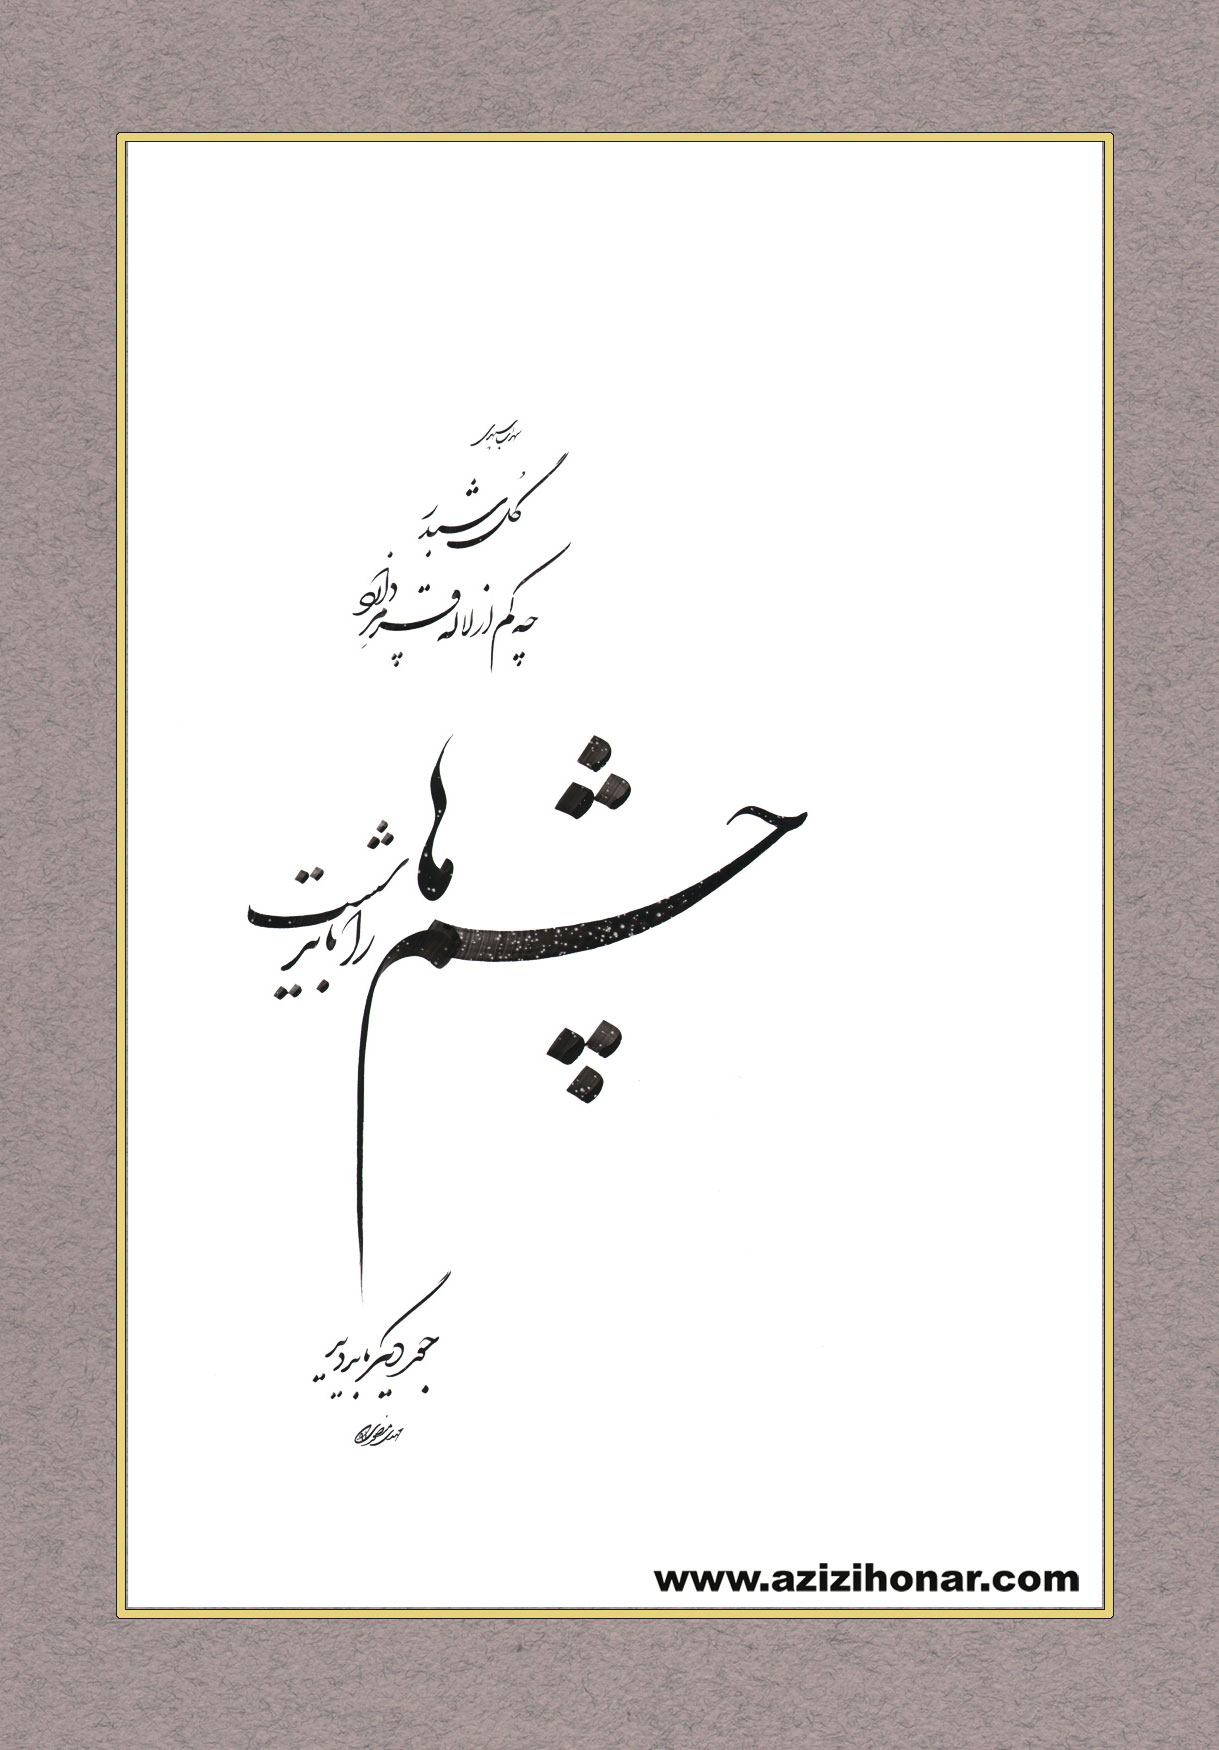 http://dl.azizihonar.com/Exhibition1/exhibition-mehdi-mansuori-17.jpg